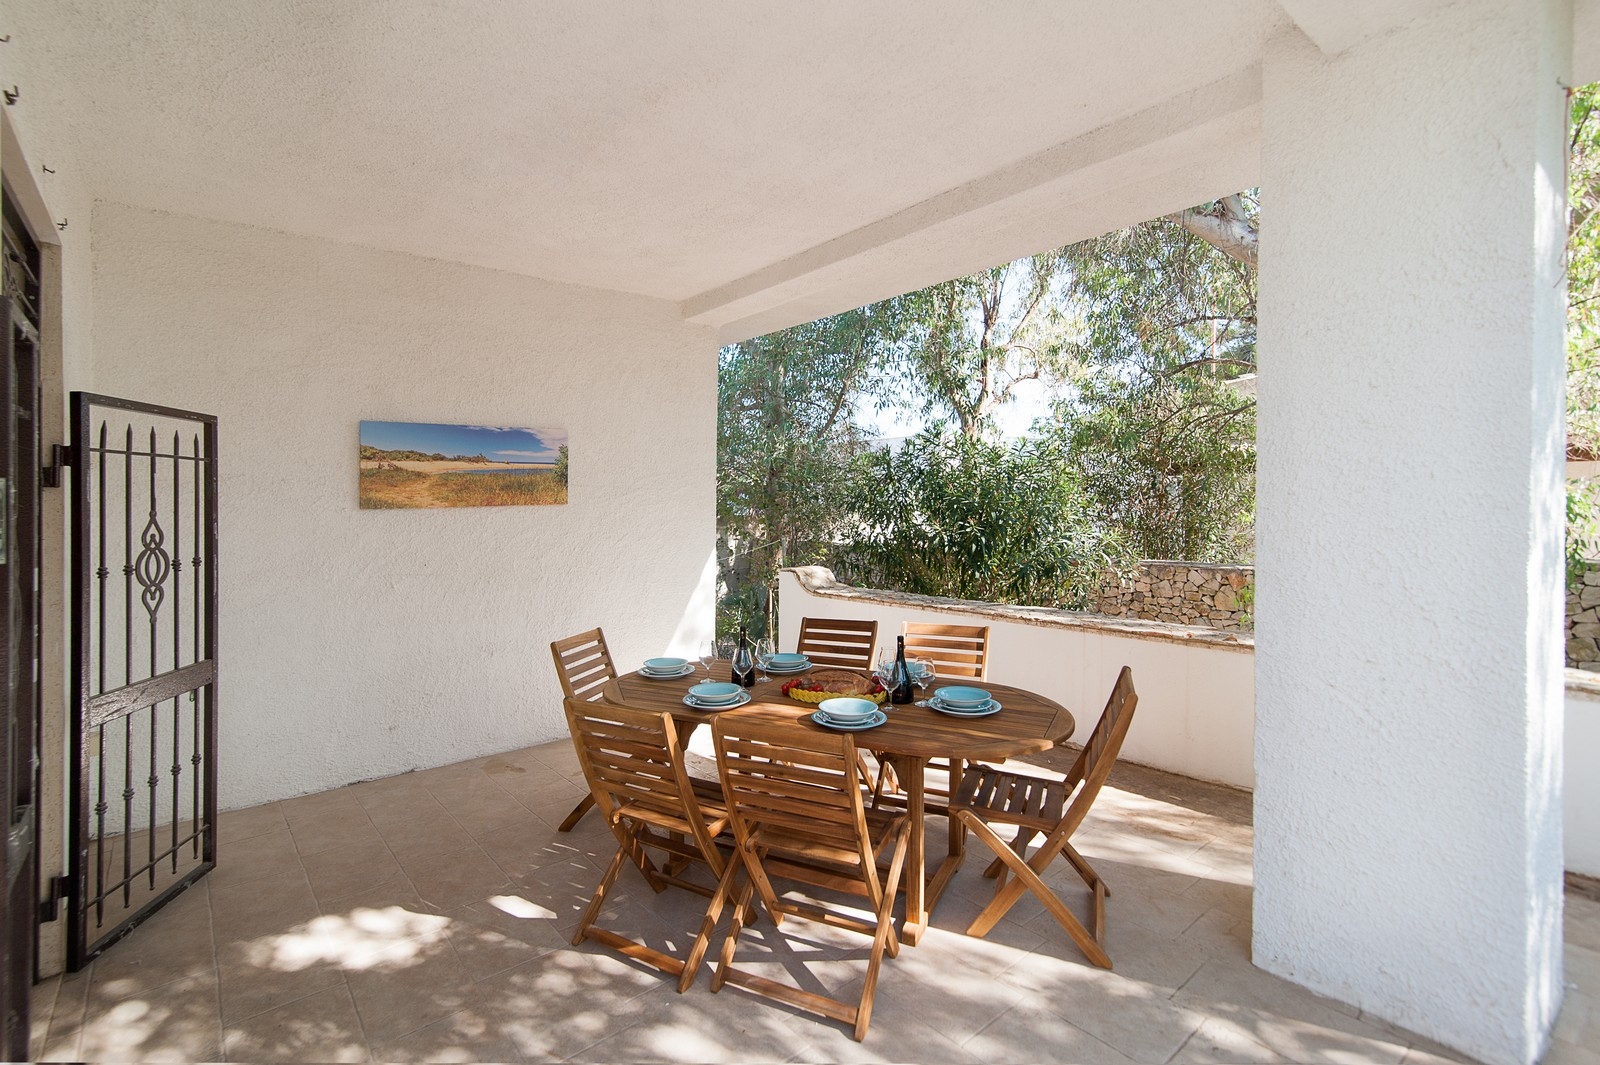 Ferienhaus Villa Mariposa  n. 2-150 meters from the beach (2354066), Porto Cesareo, Lecce, Apulien, Italien, Bild 1